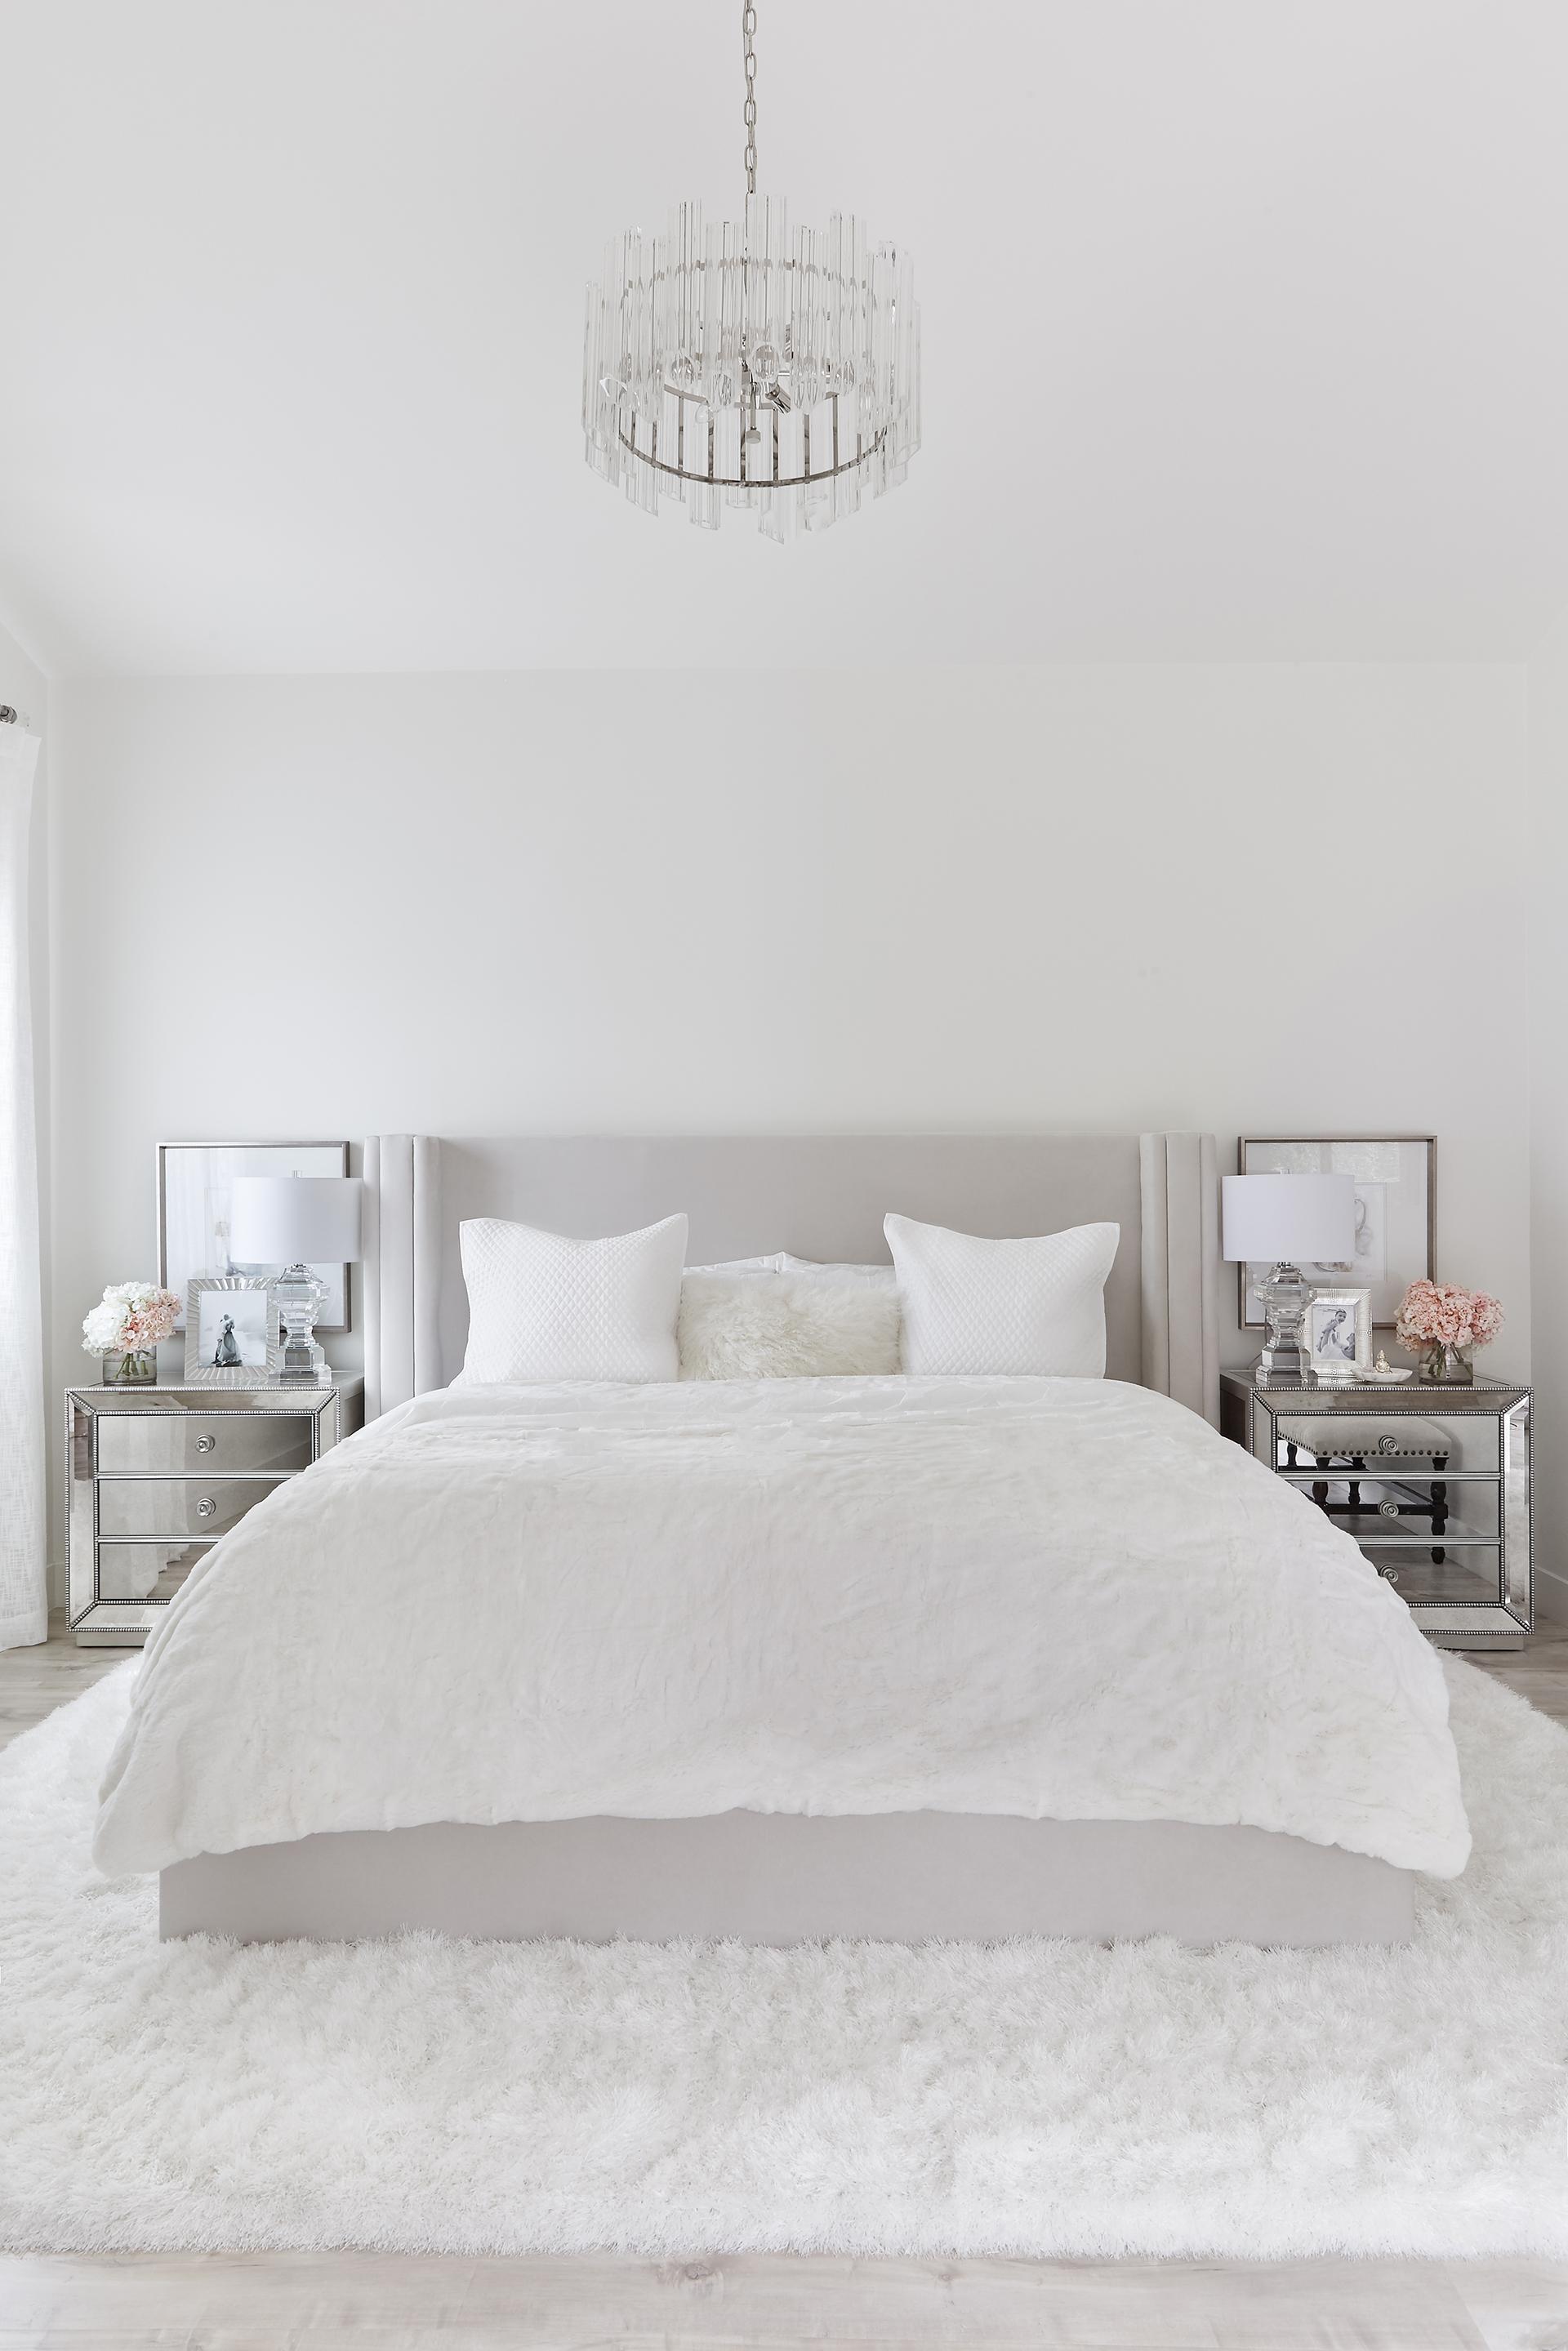 Master Bedroom Makeover Reveal! - mywhiteT